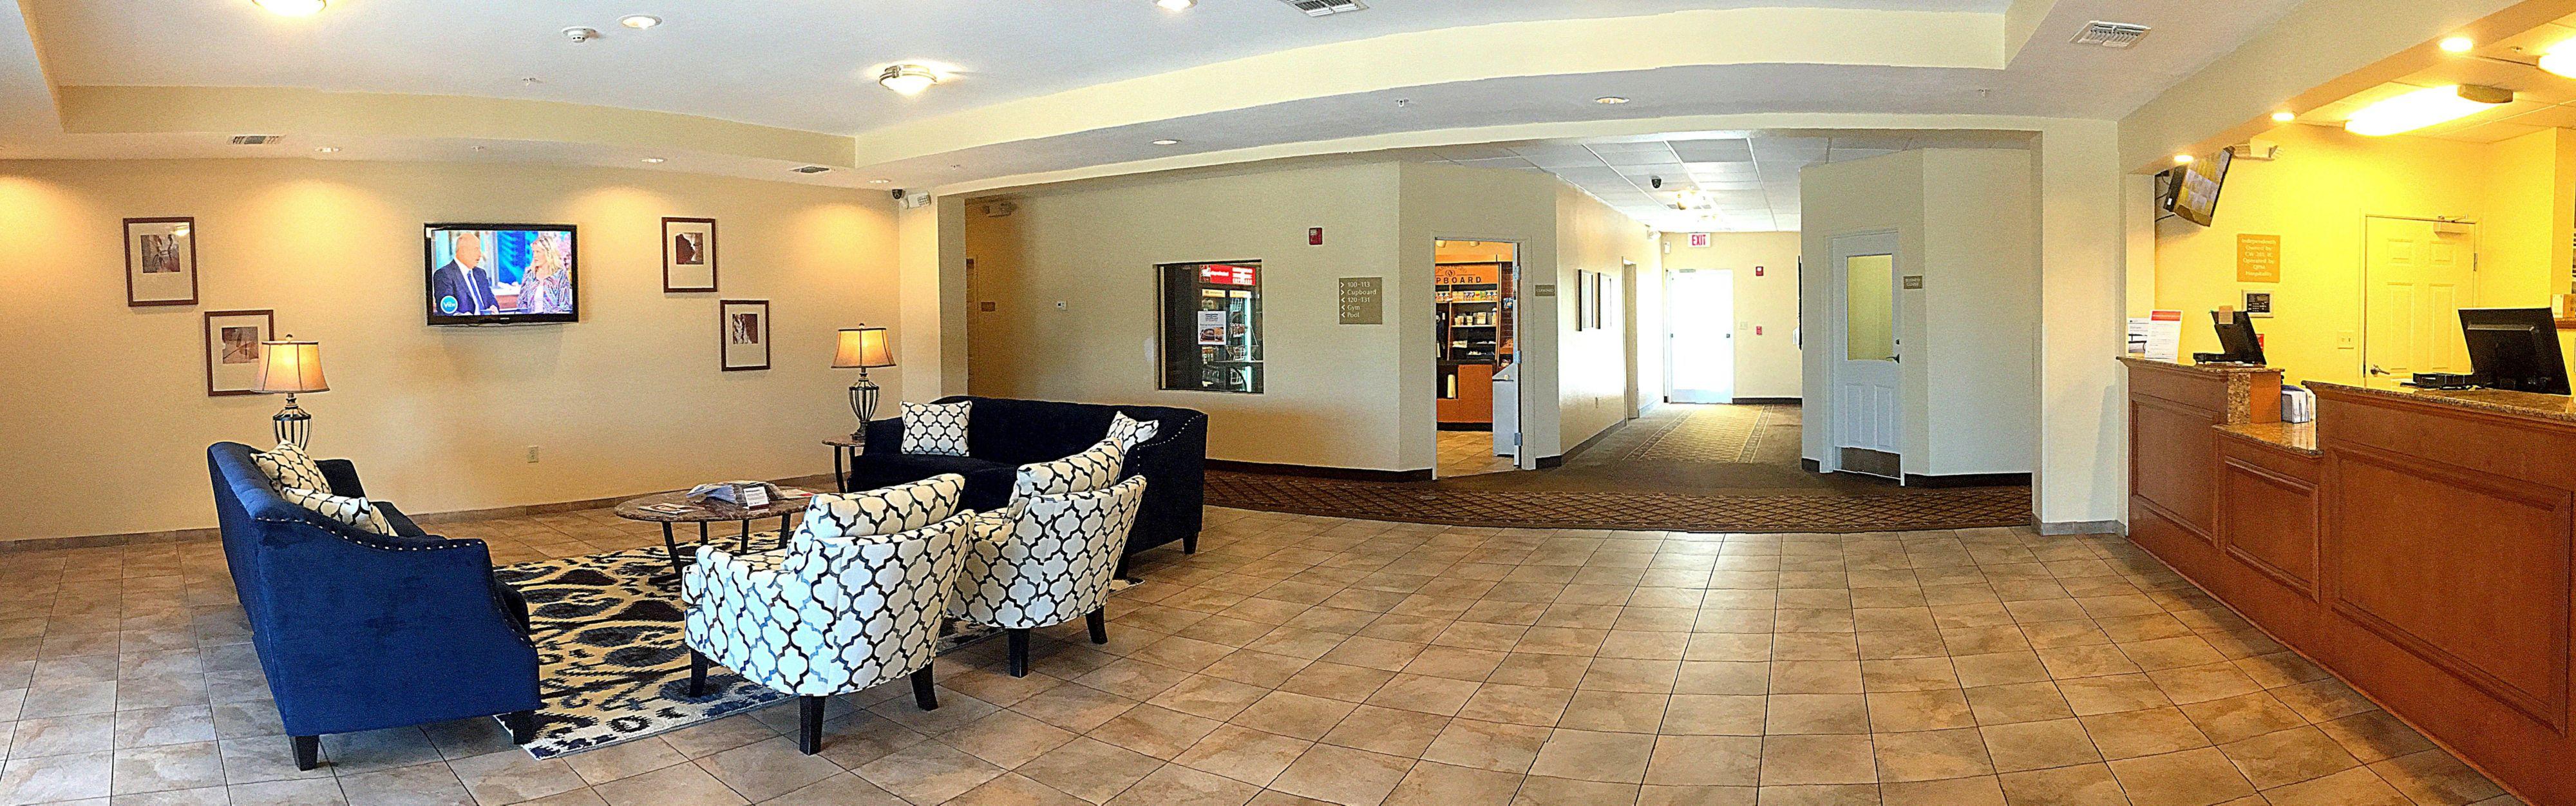 Candlewood Suites San Antonio N Stone Oak Area San